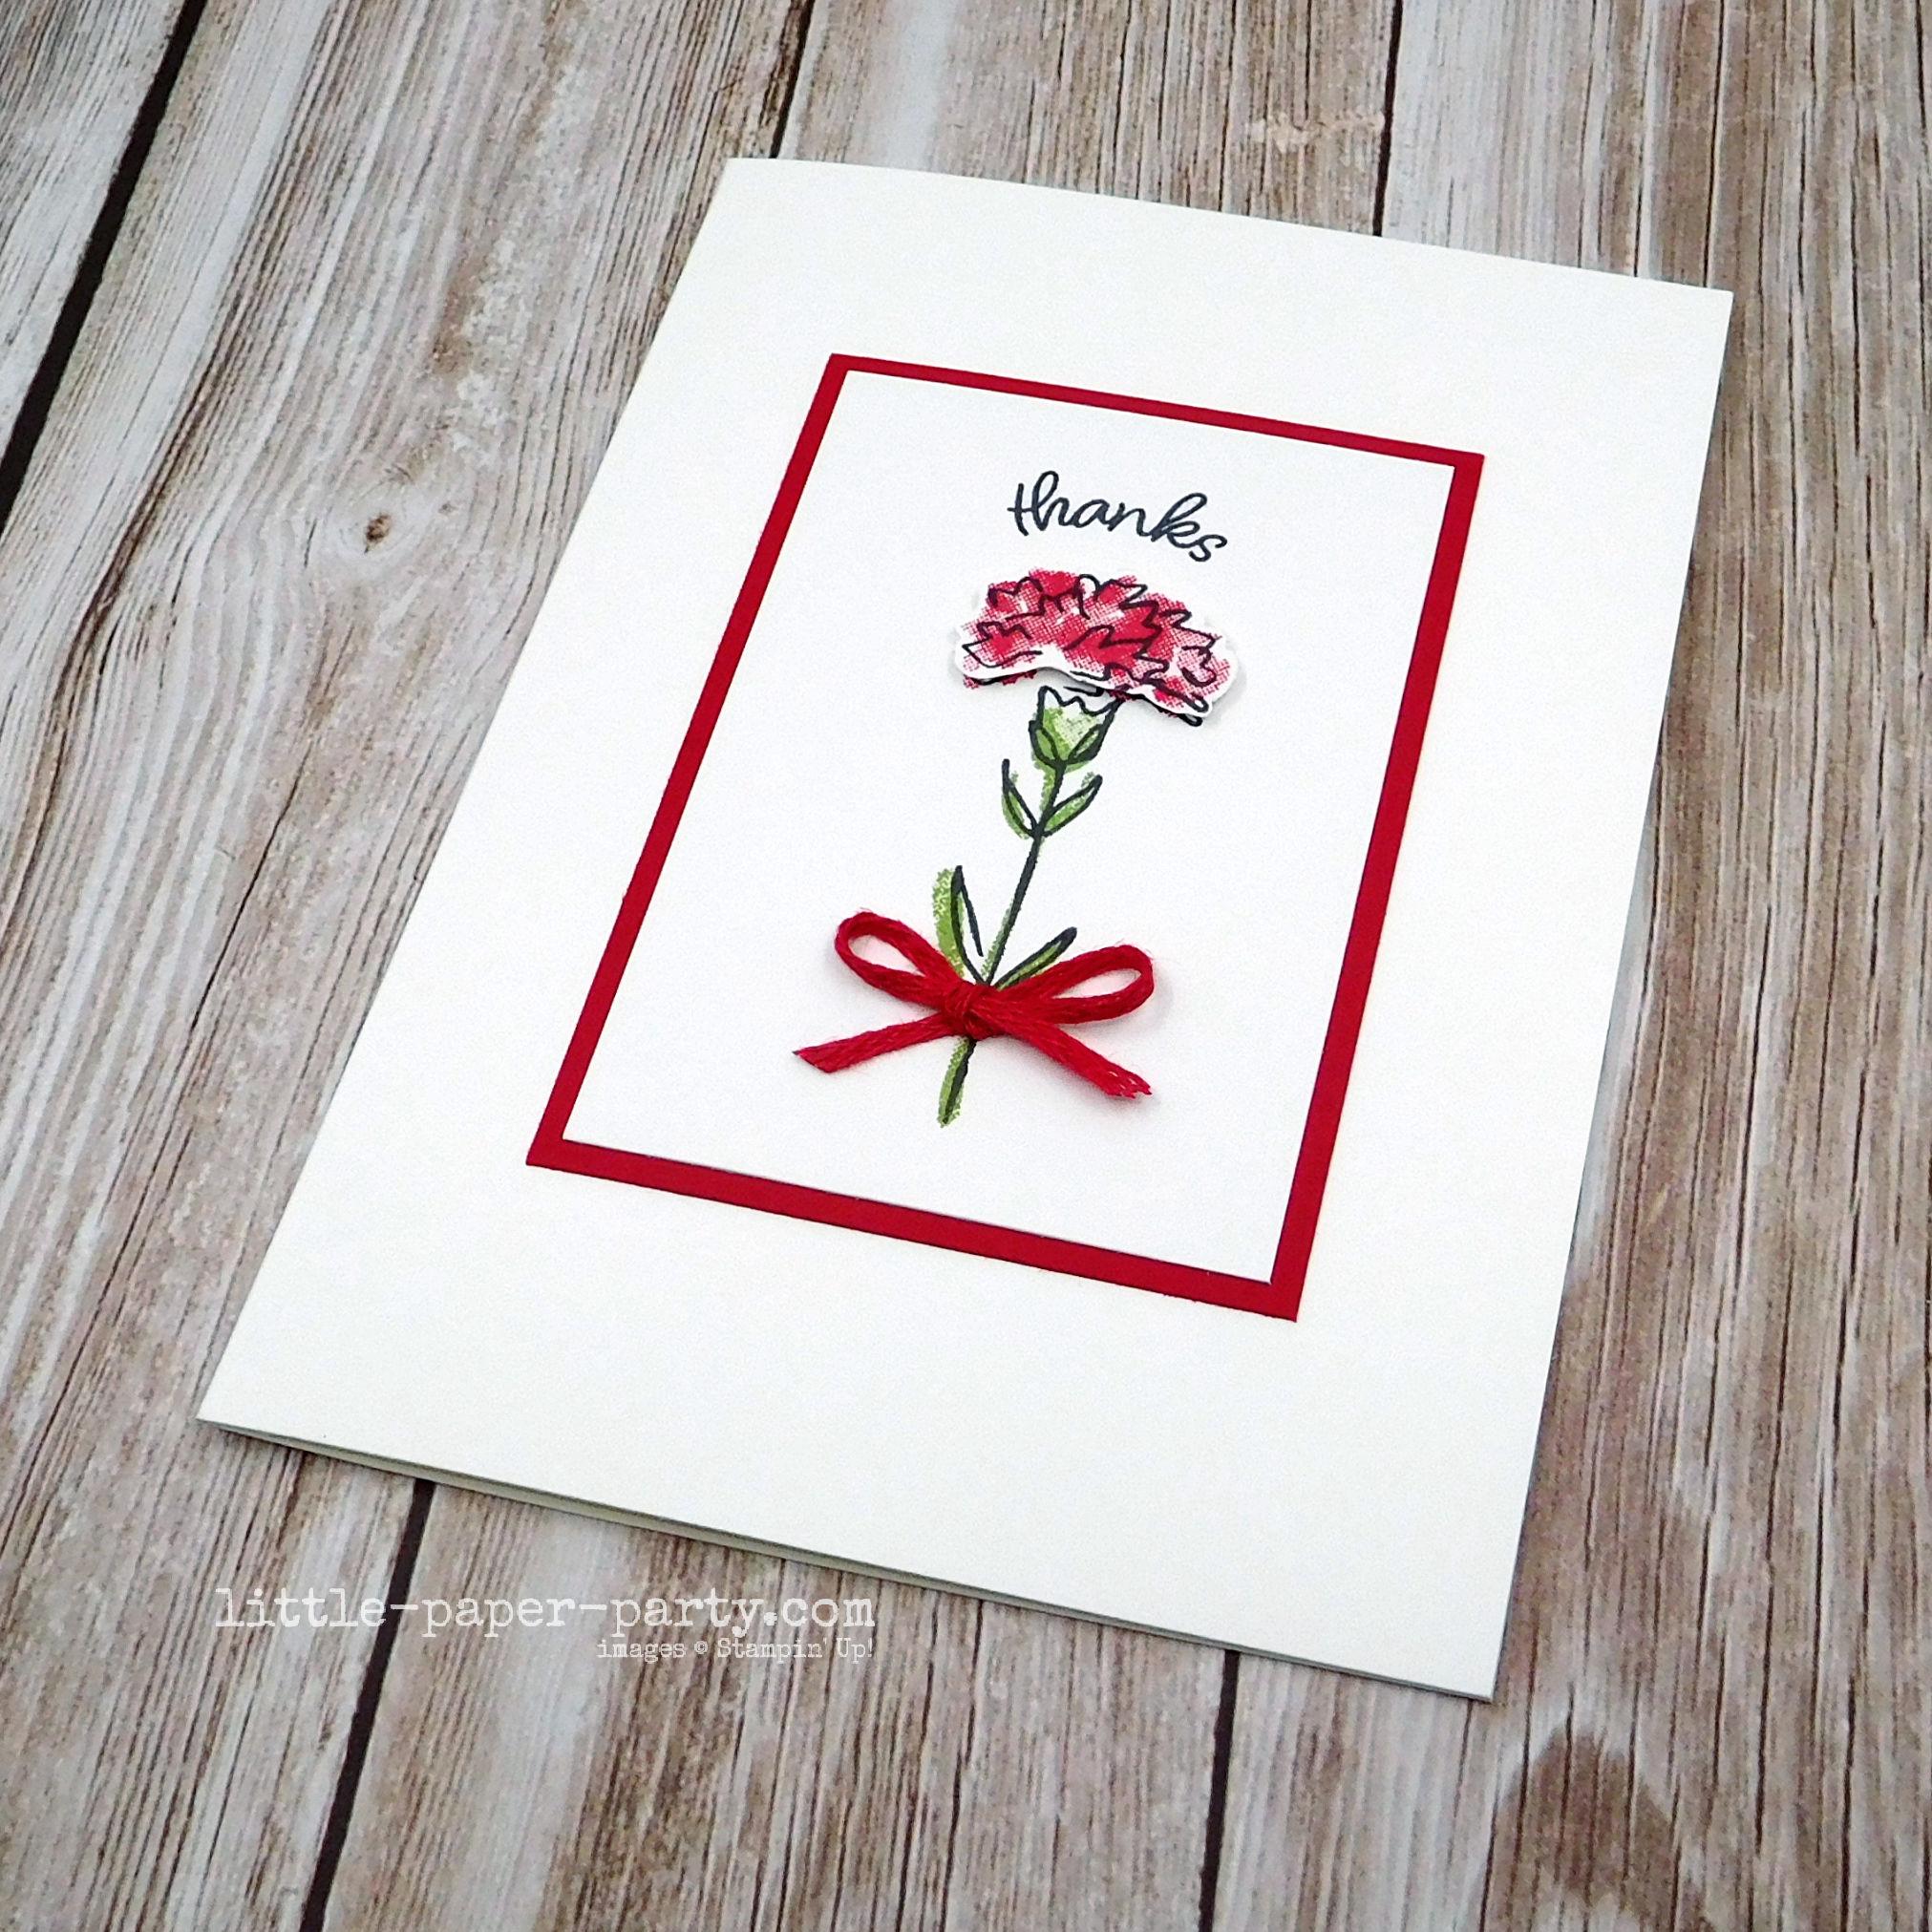 Little Paper Party, #simplestamping, Inspiring Iris, 2